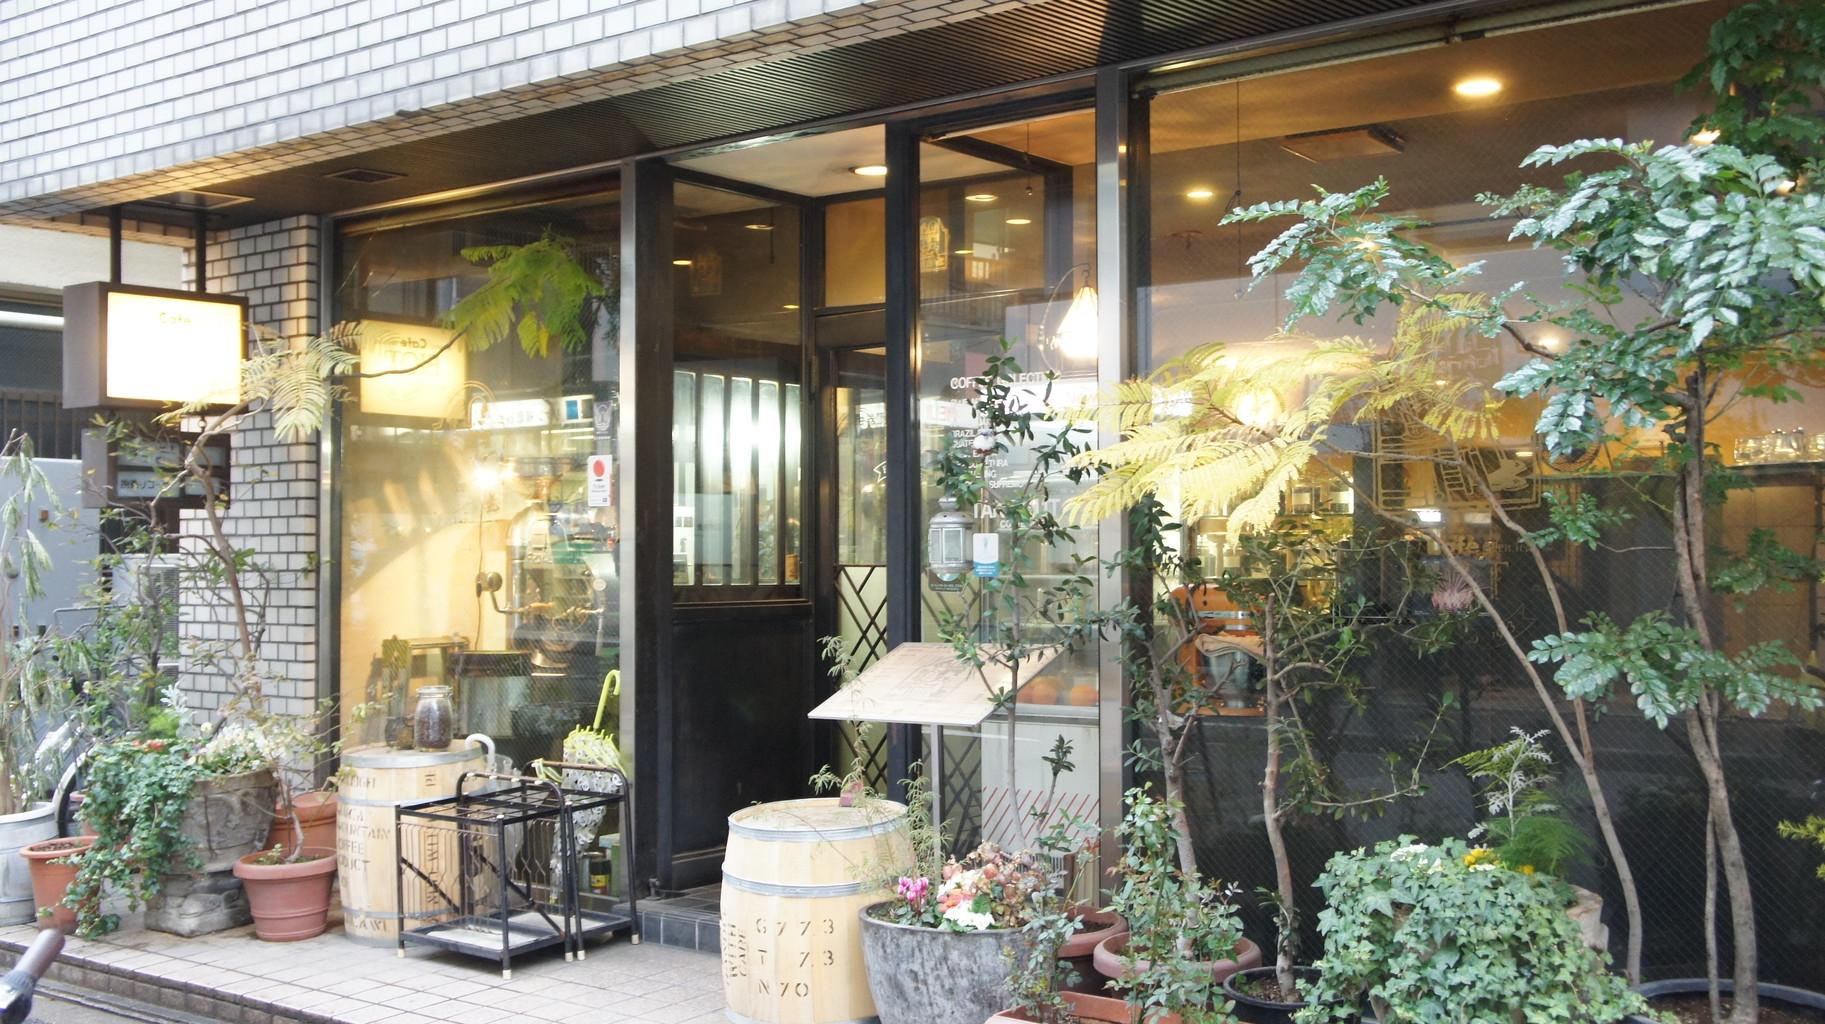 「Cafe BIOT(東京都千代田区神田美倉町1番)」の画像検索結果